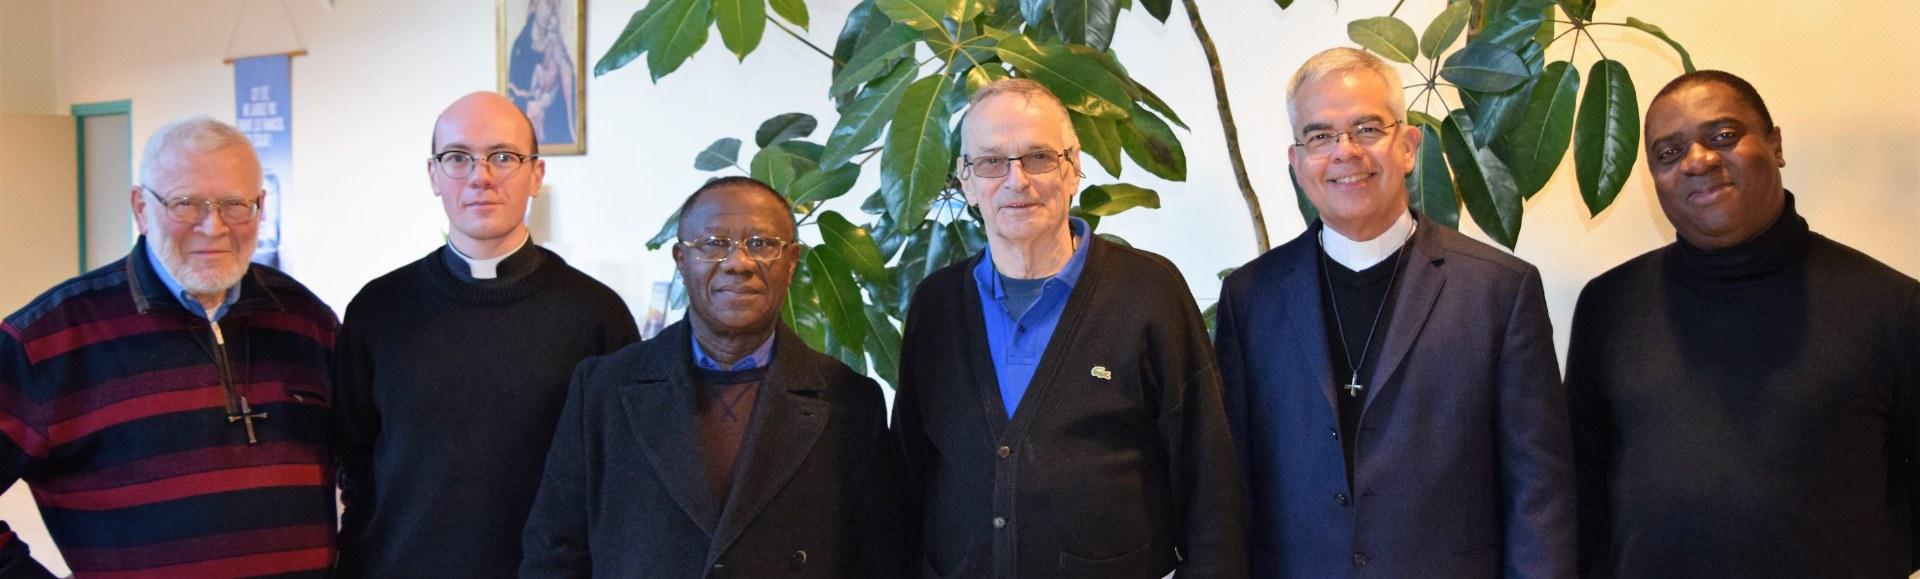 l'equipe sacerdotale NDSC 2018-2019